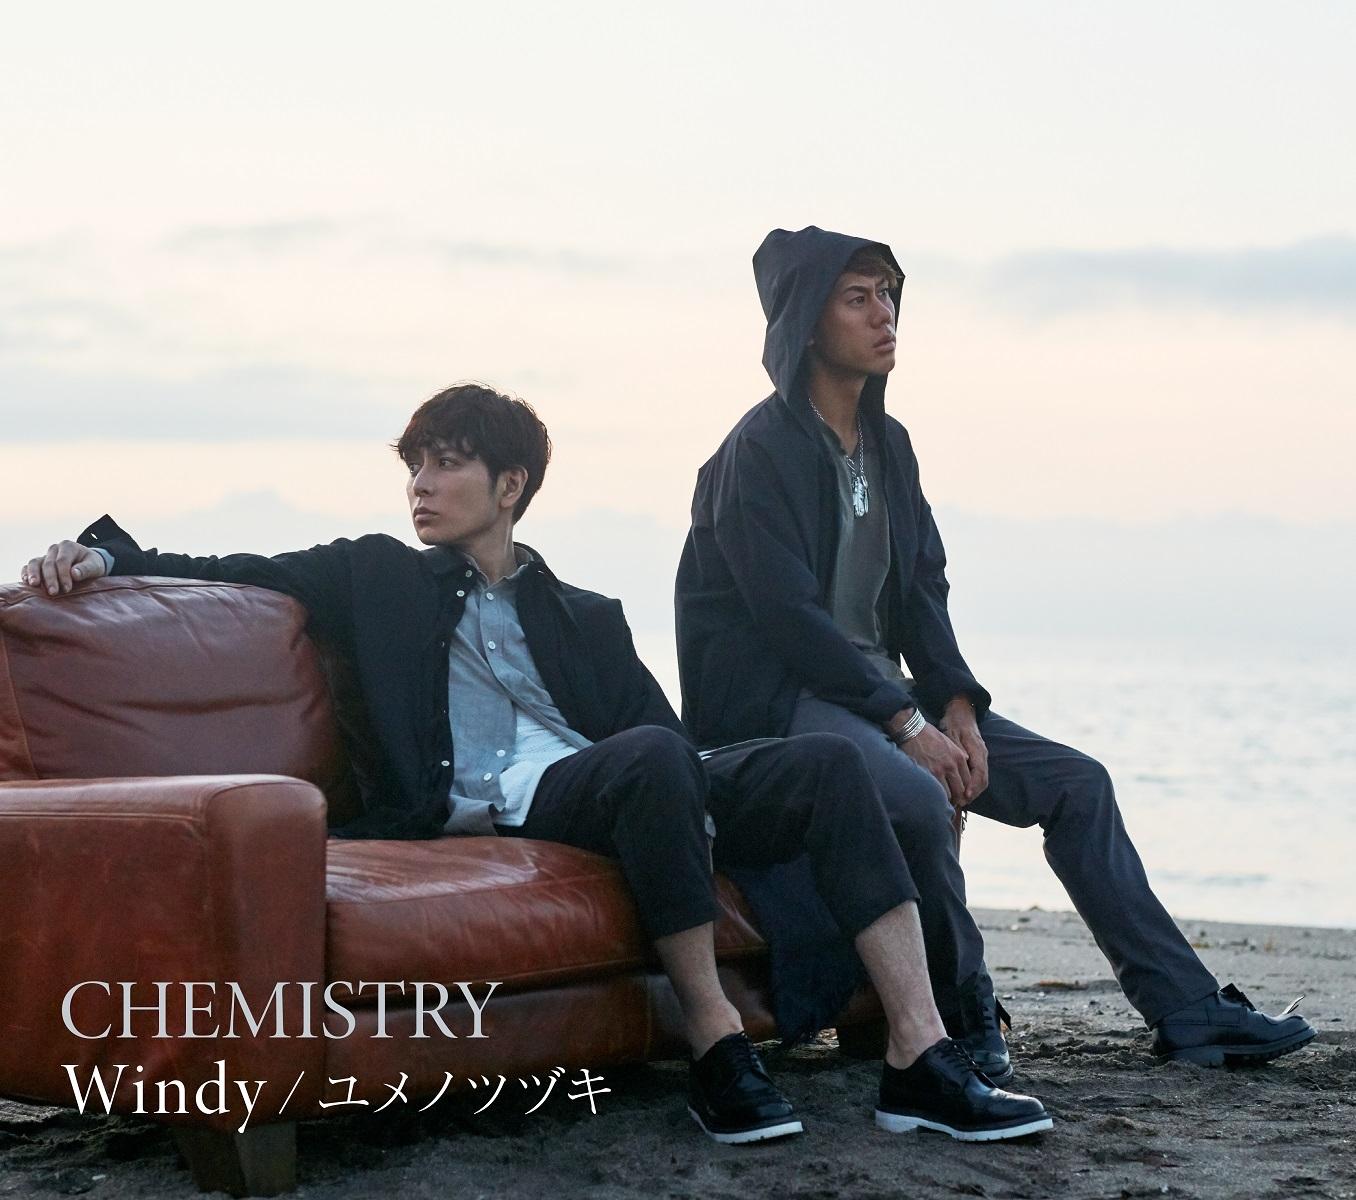 CHEMISTRY「Windy / ユメノツヅキ」初回盤